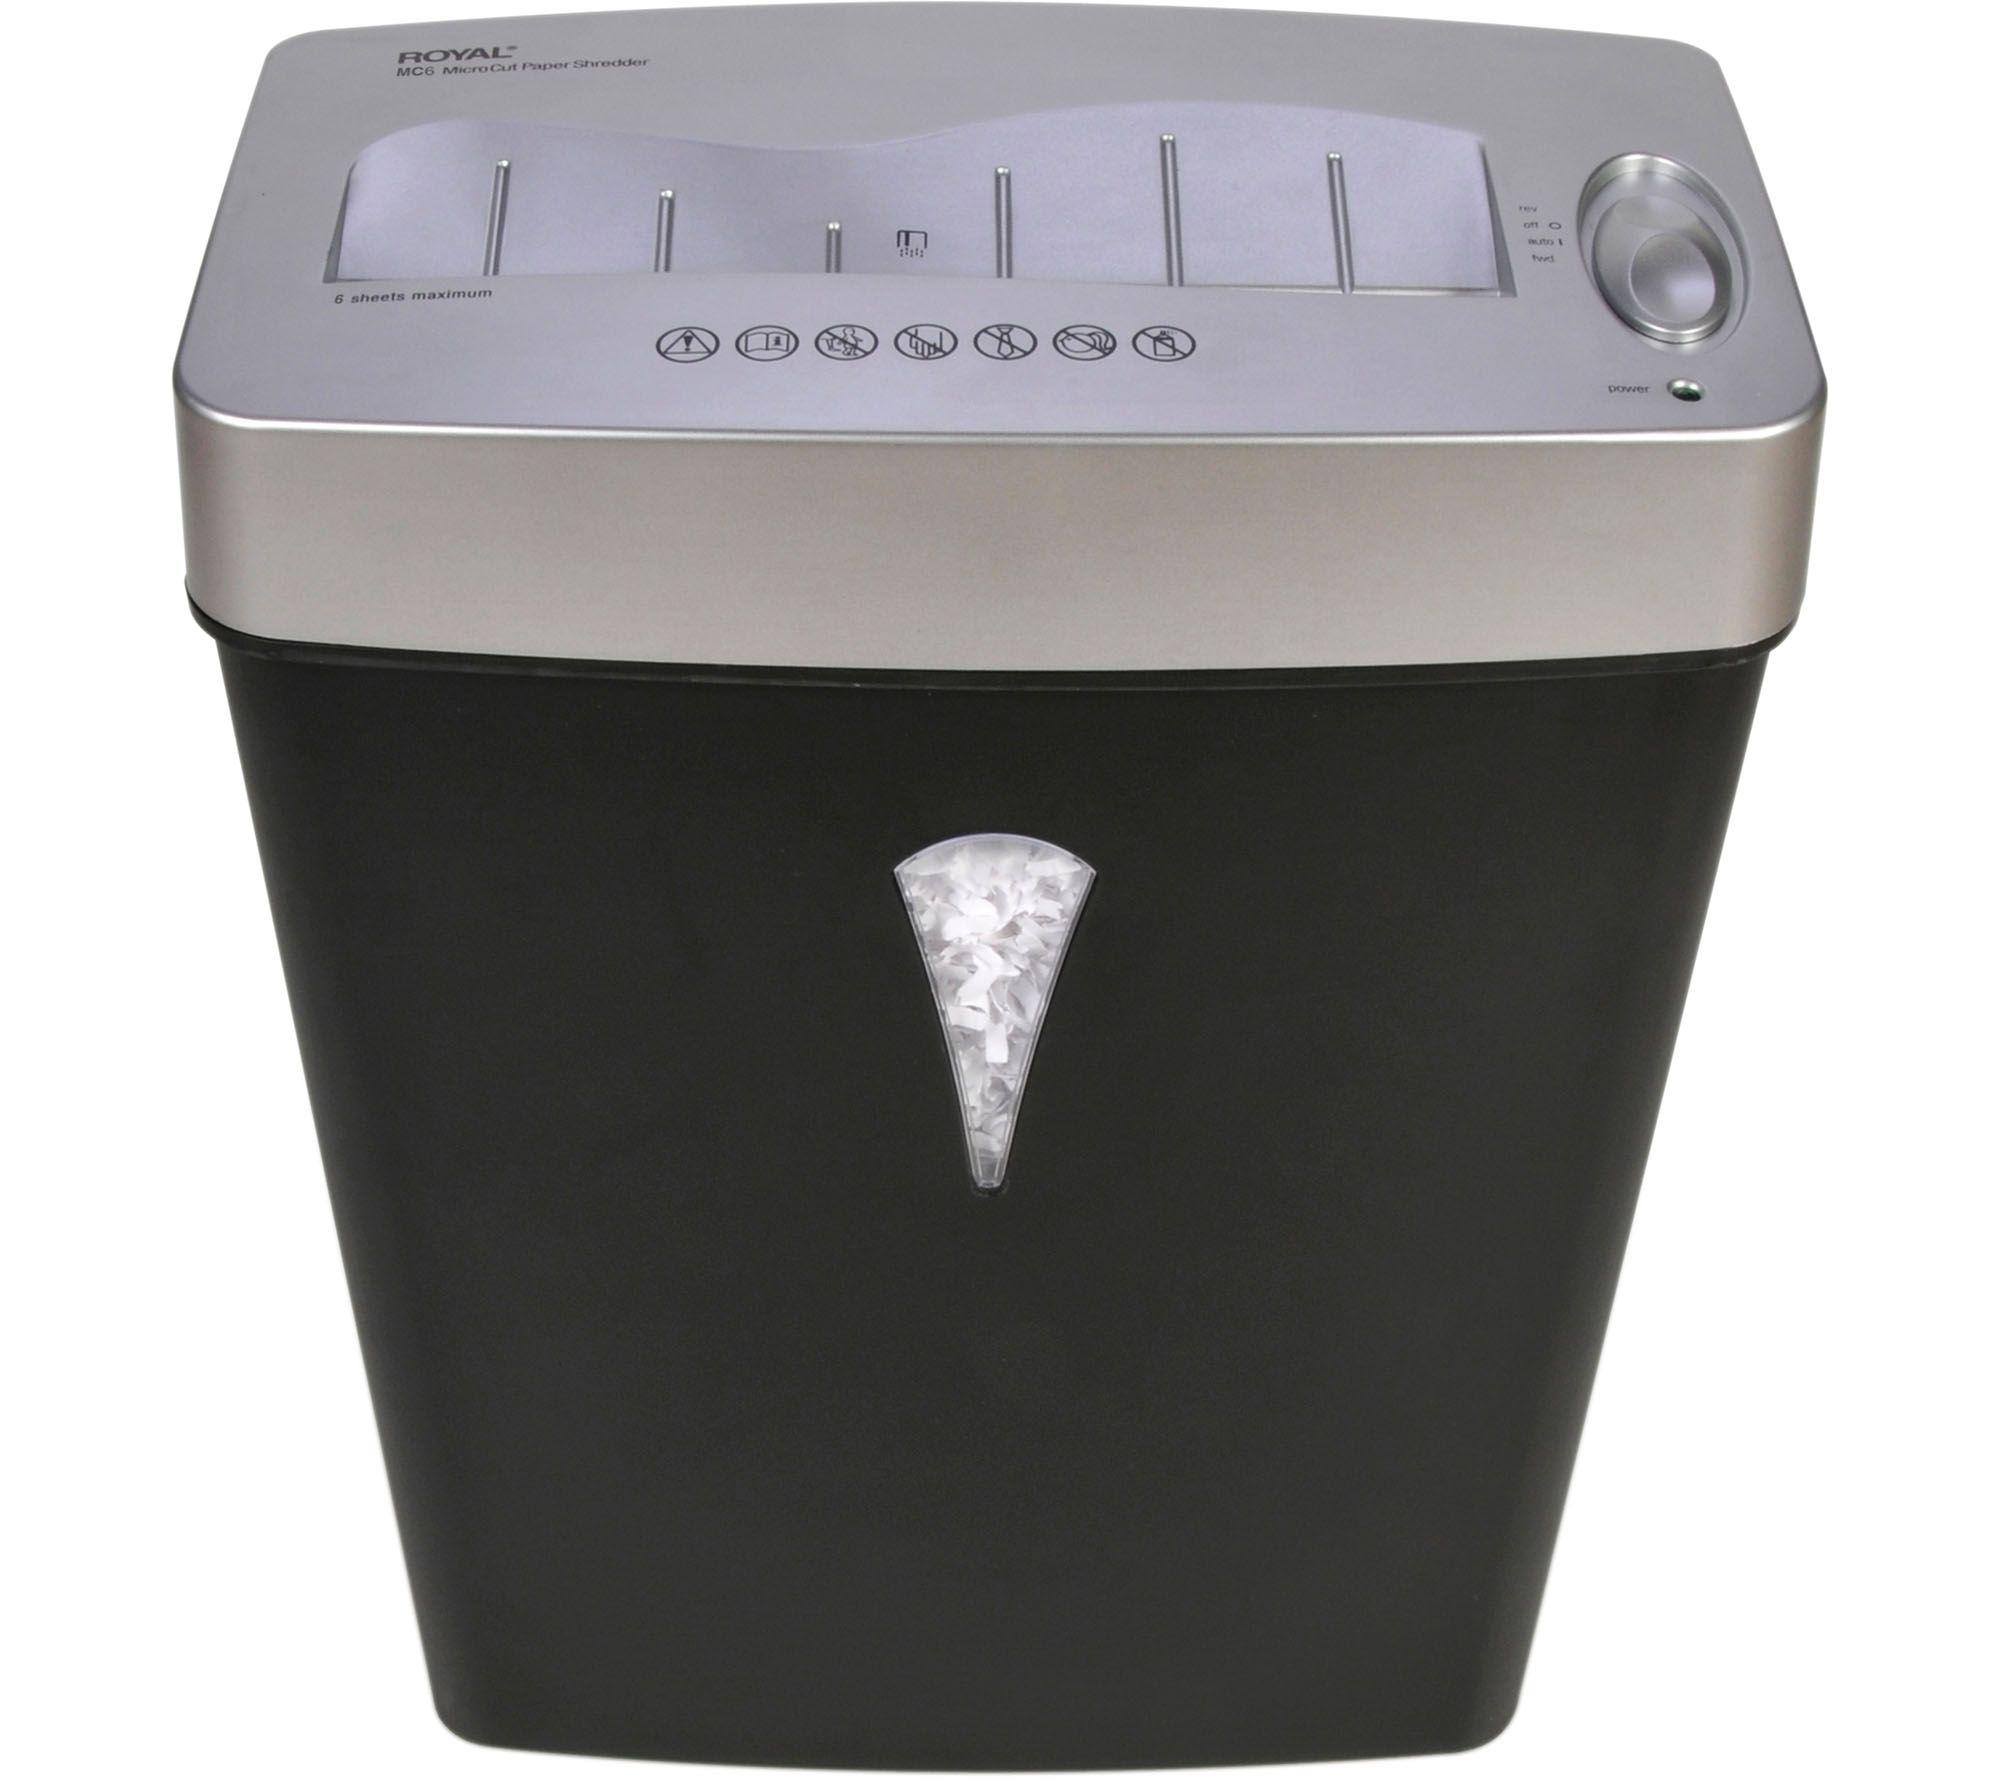 royal mc6 6 sheet micro cut shredder with liftoff basket e230843 - Home Shredders